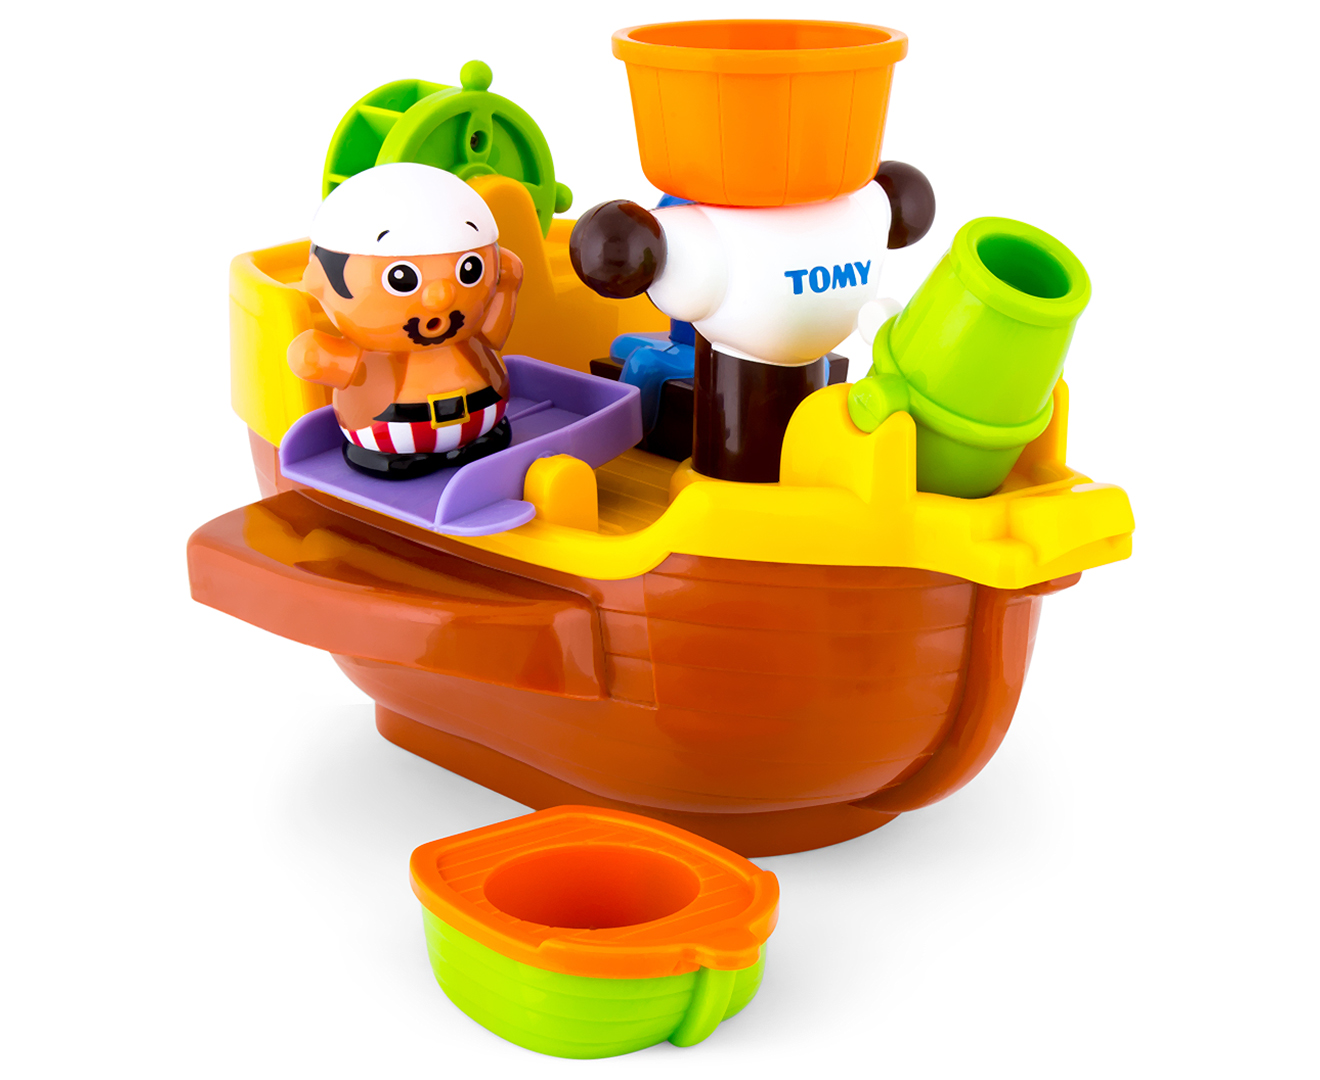 TOMY Pirate Bath Ship 5011666716025 | eBay